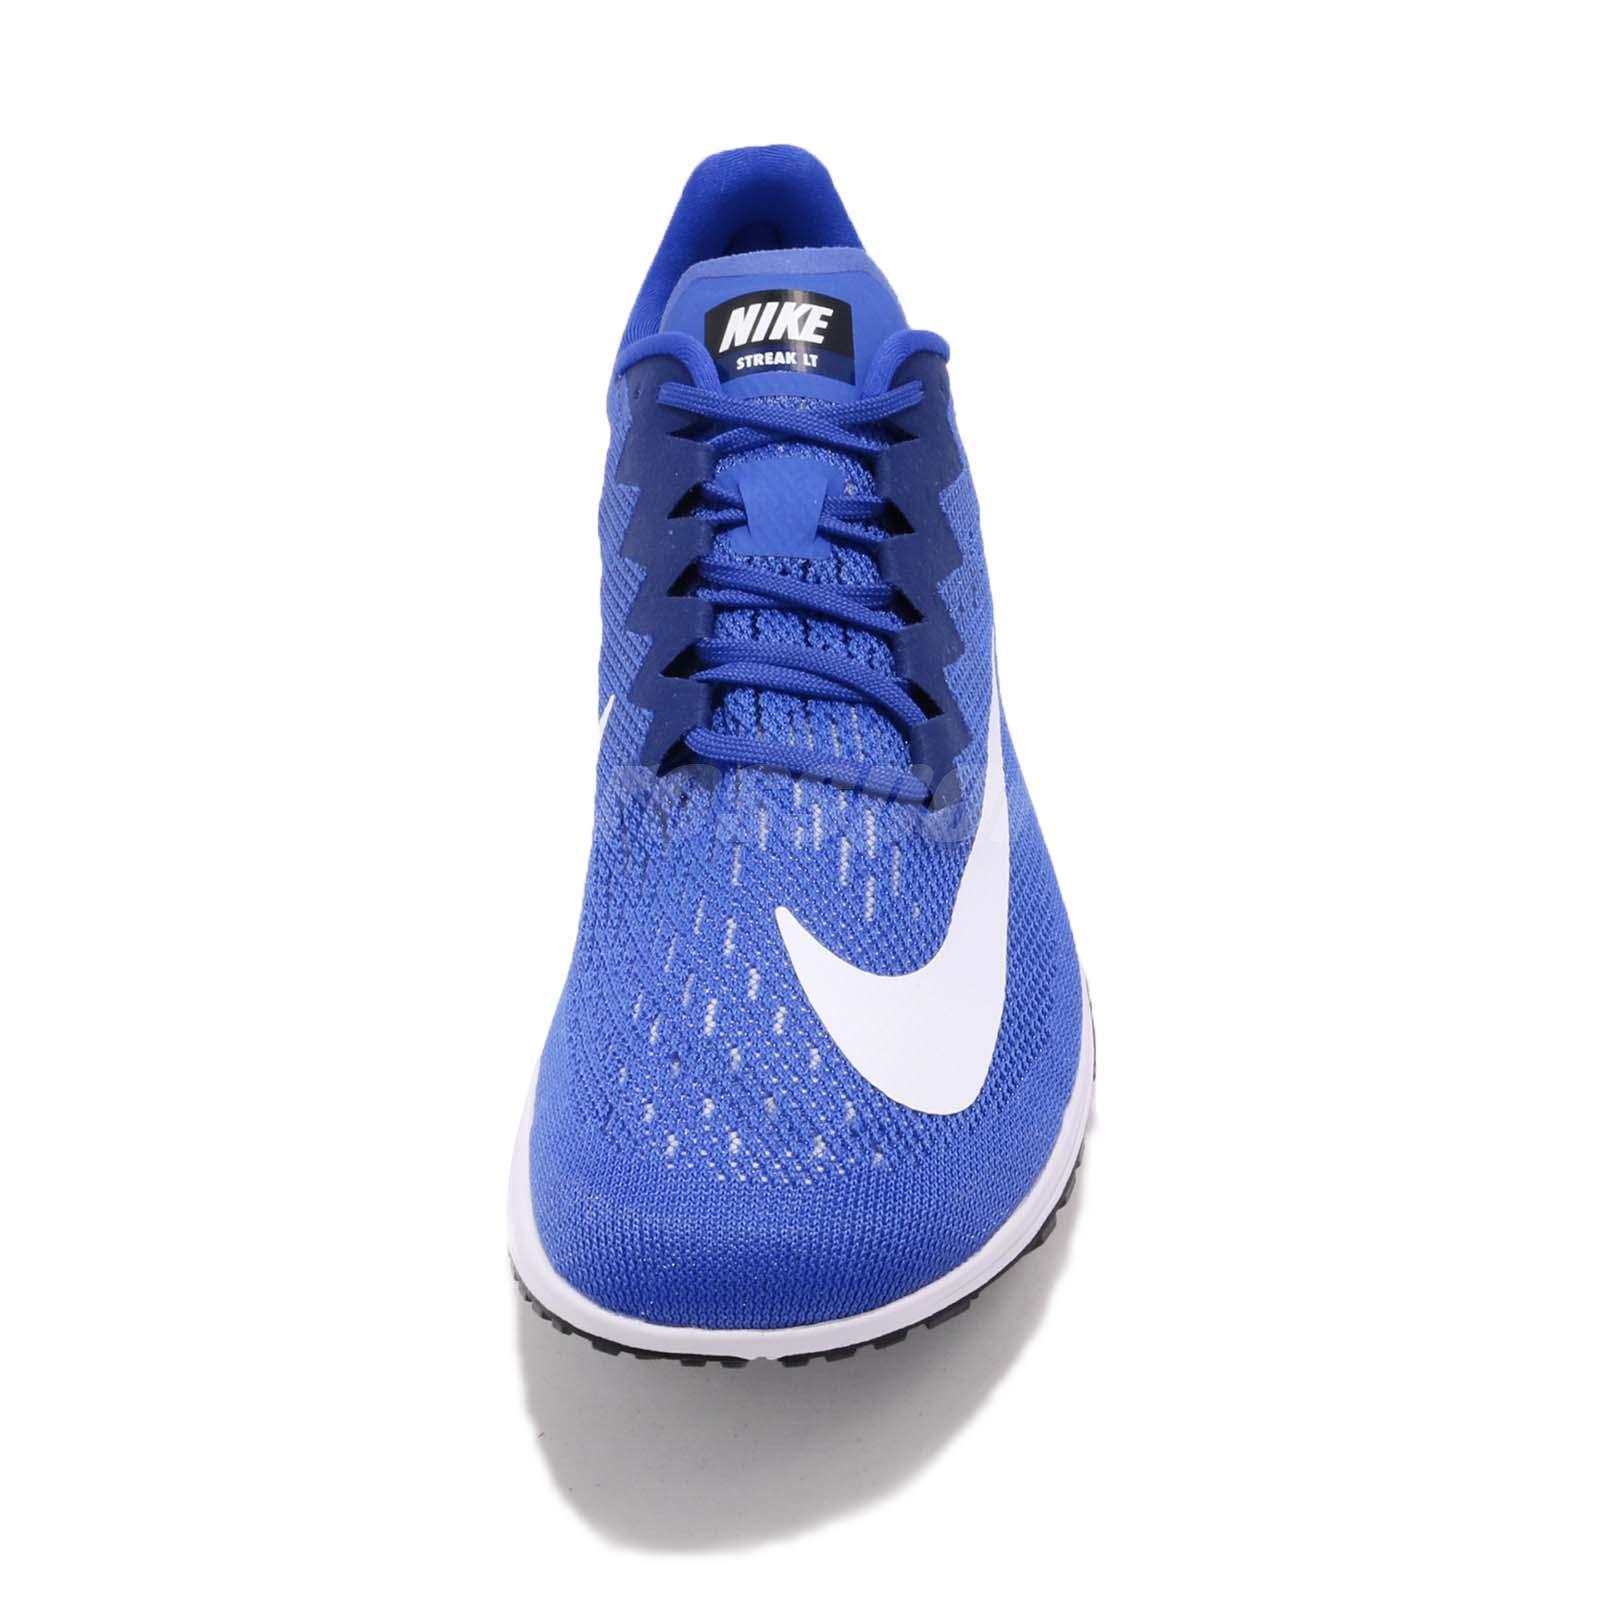 Nike Air Zoom Streak LT 4 IV Hyper Royal White Men Running Shoes ... 1afb0eed3